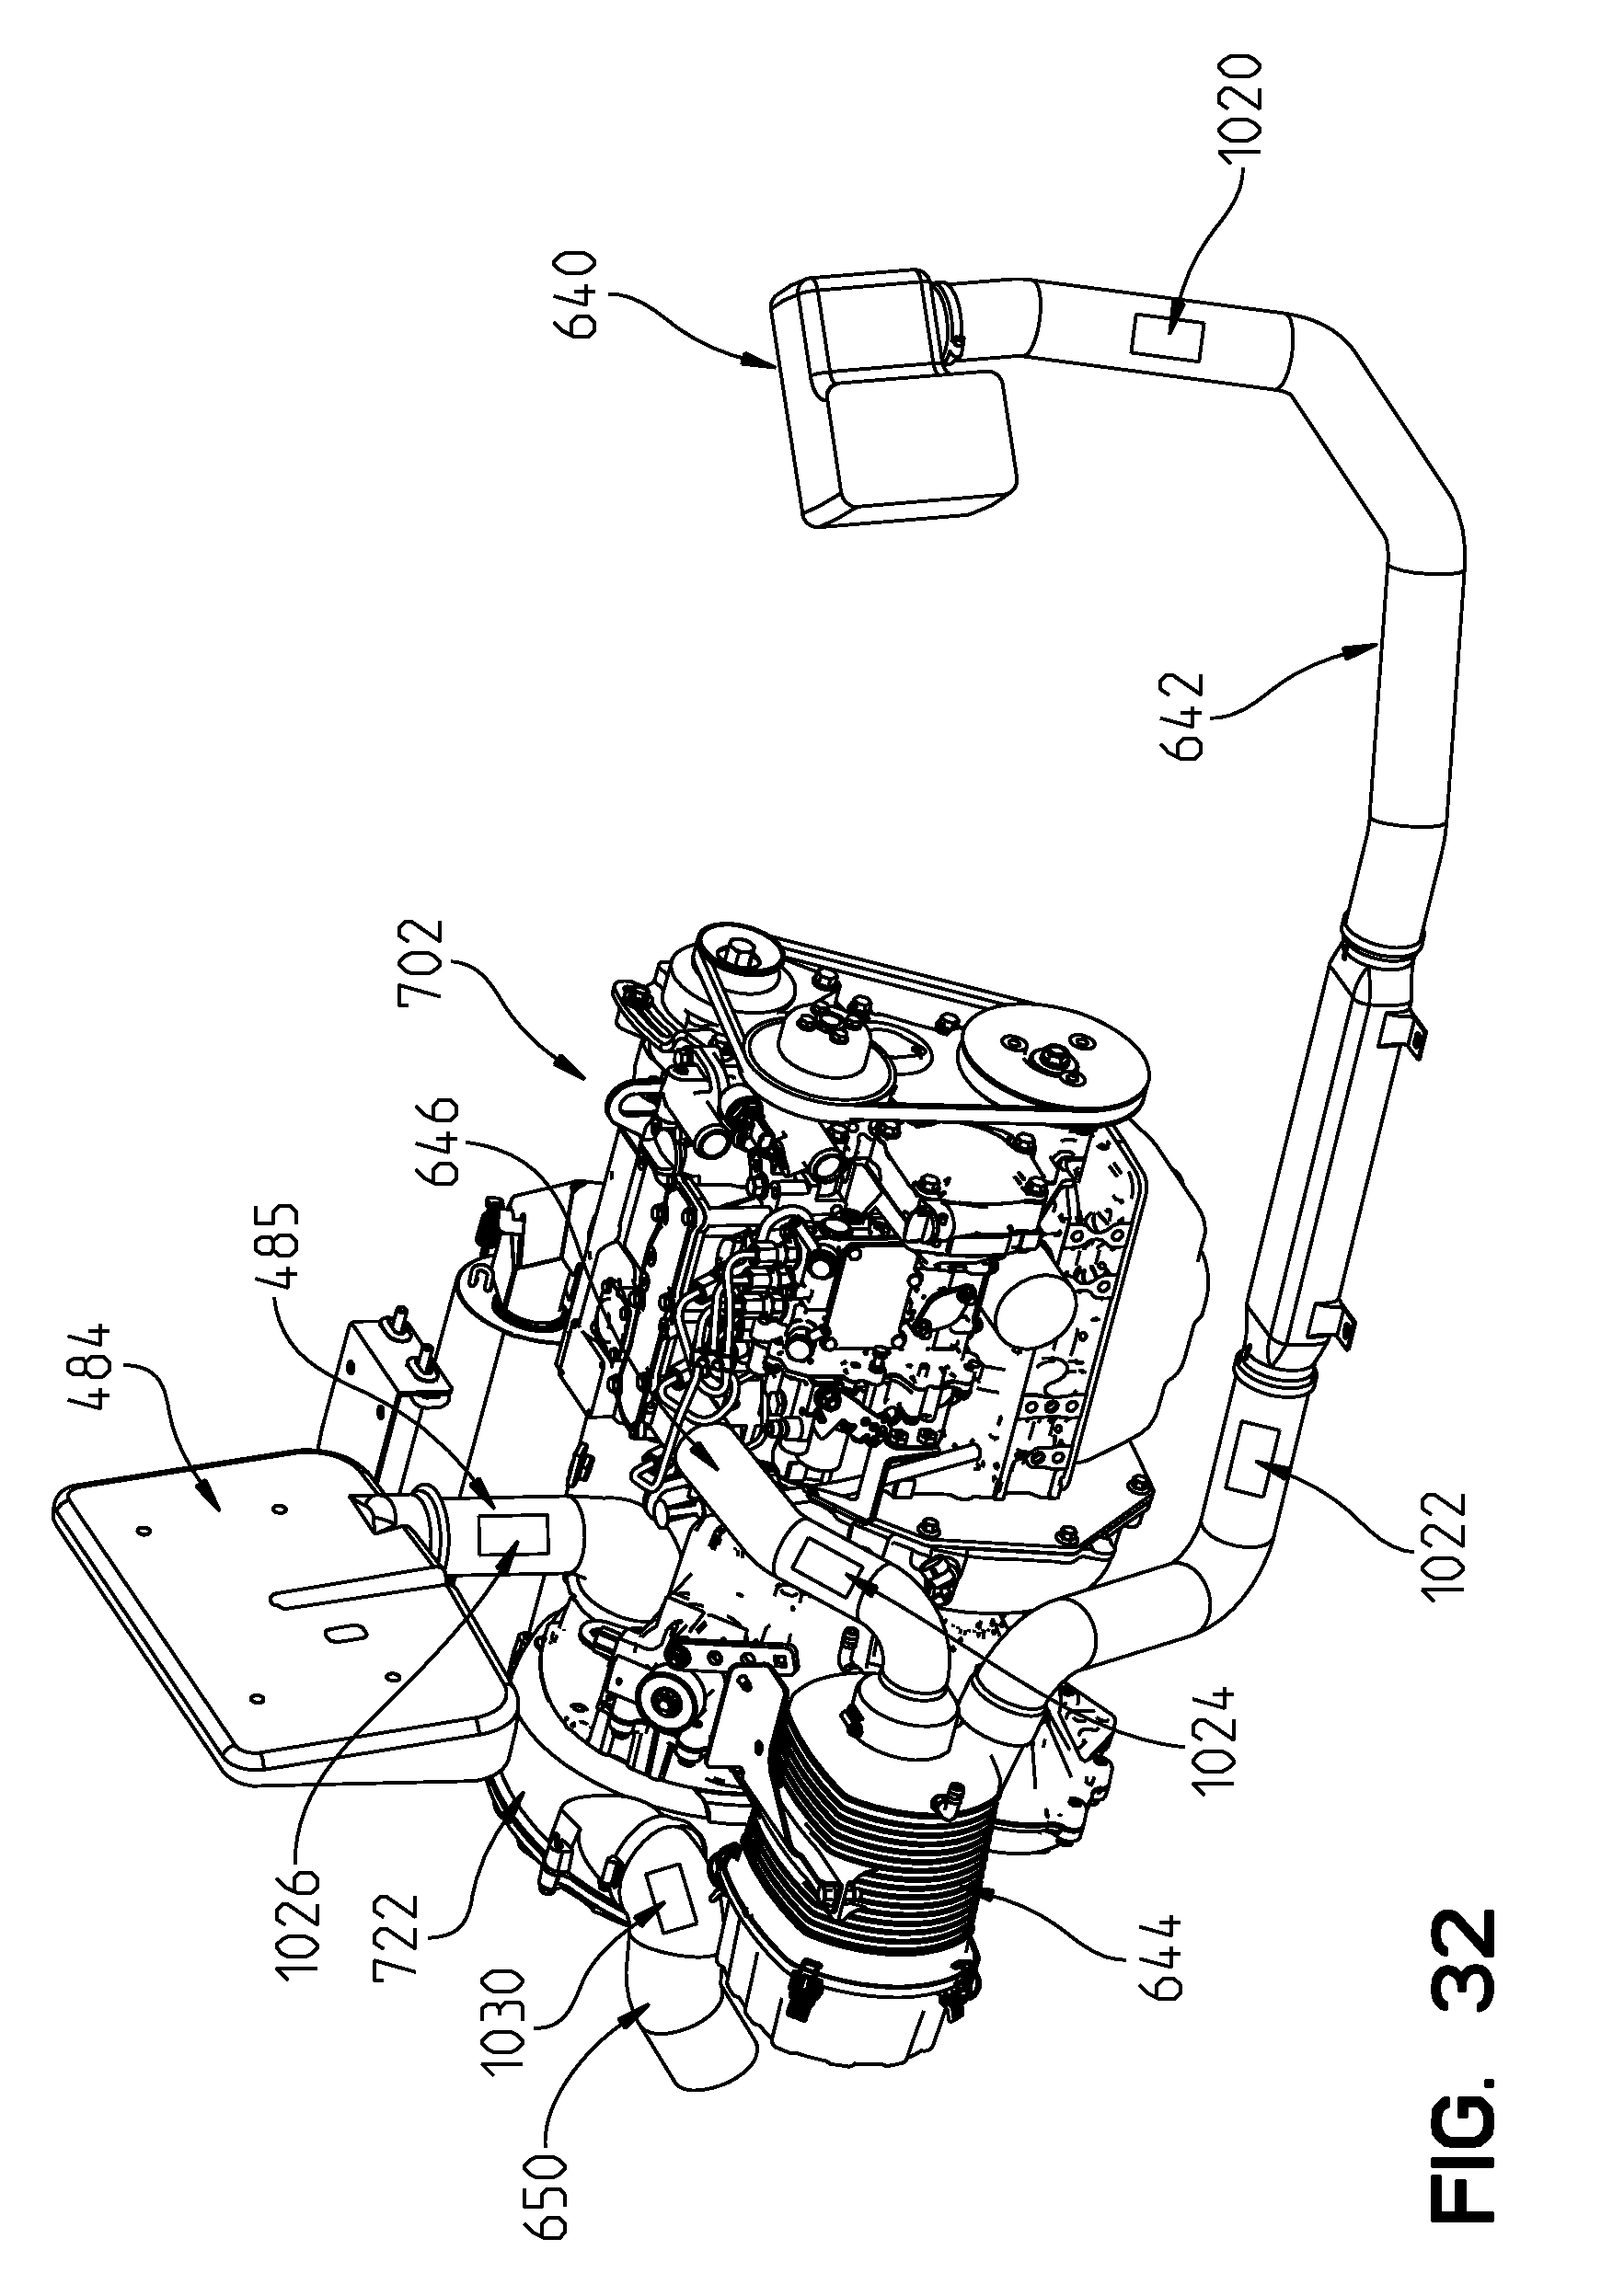 US08522911 20130903 D00033 1997 international 4900 wiring diagram 6 on 1997 international 4900 wiring diagram